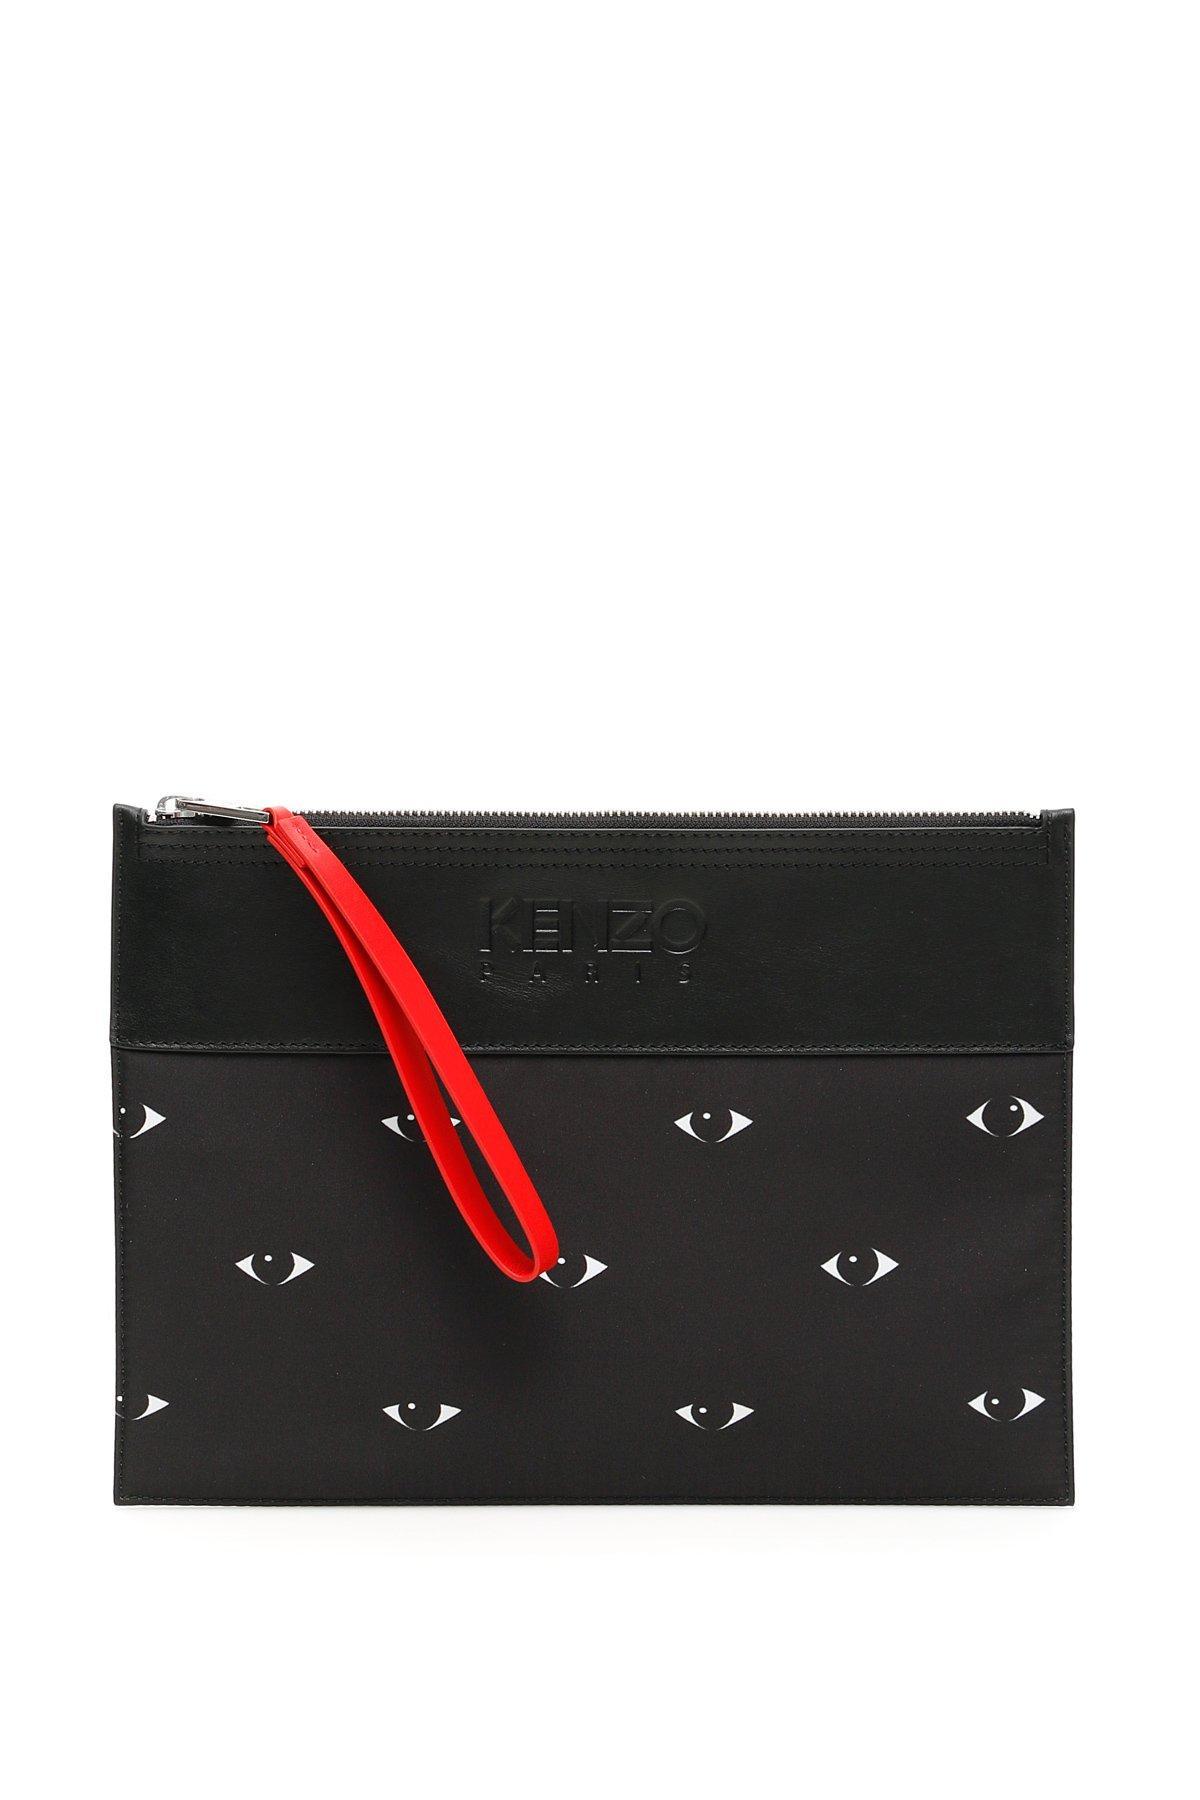 8d0f1128c8c KENZO A4 Eye Clutch Bag in Black for Men - Lyst